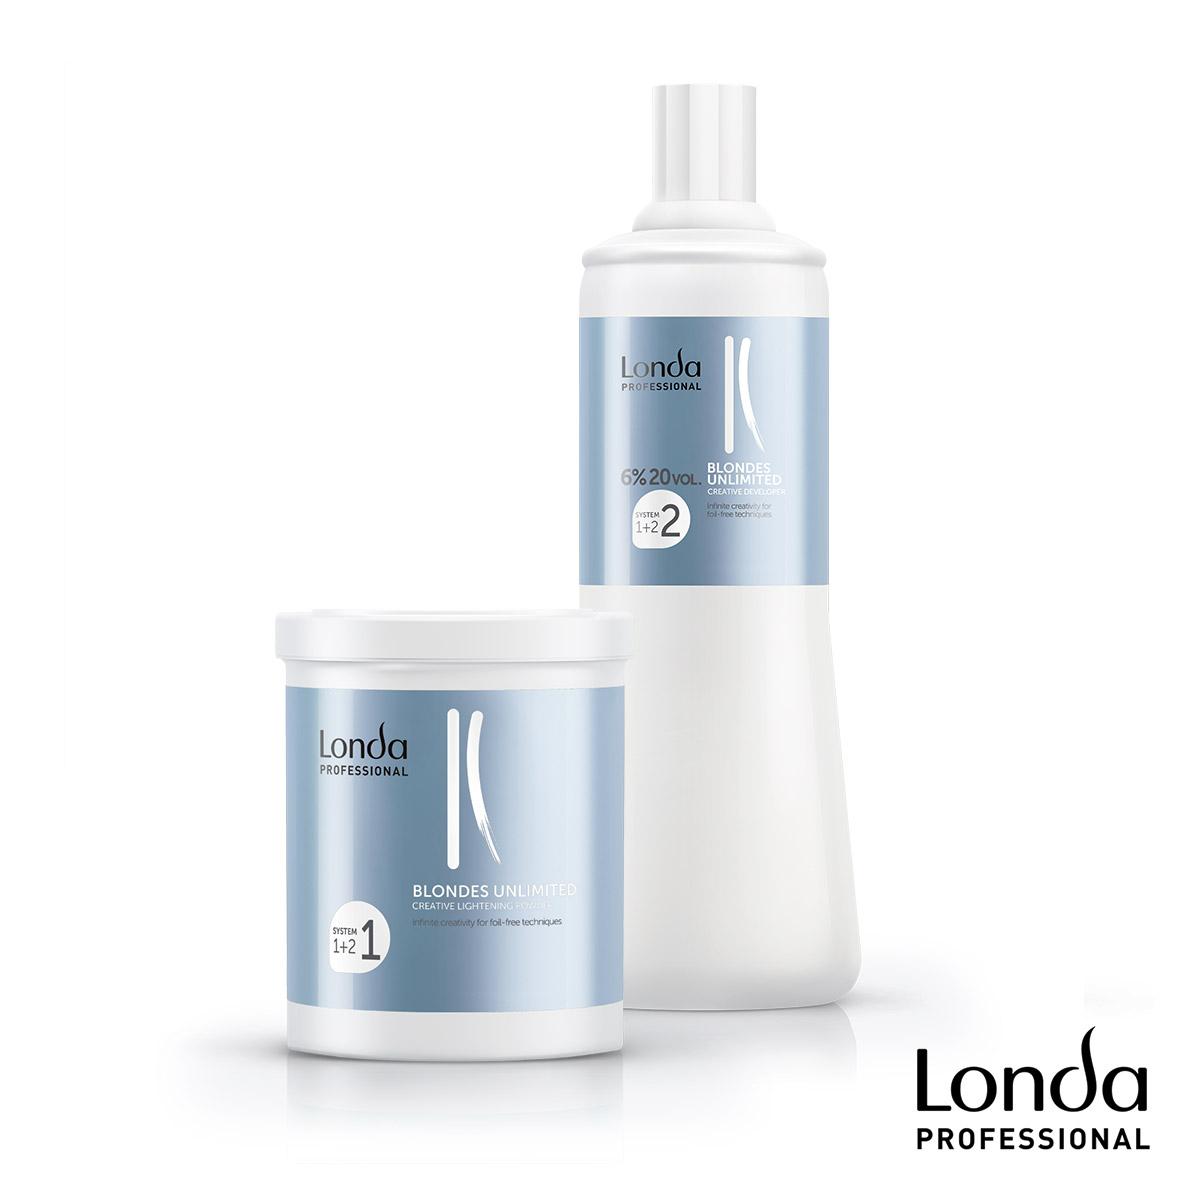 LONDA PROFESSIONAL BLONDES UNLIMITED - Professional Brands